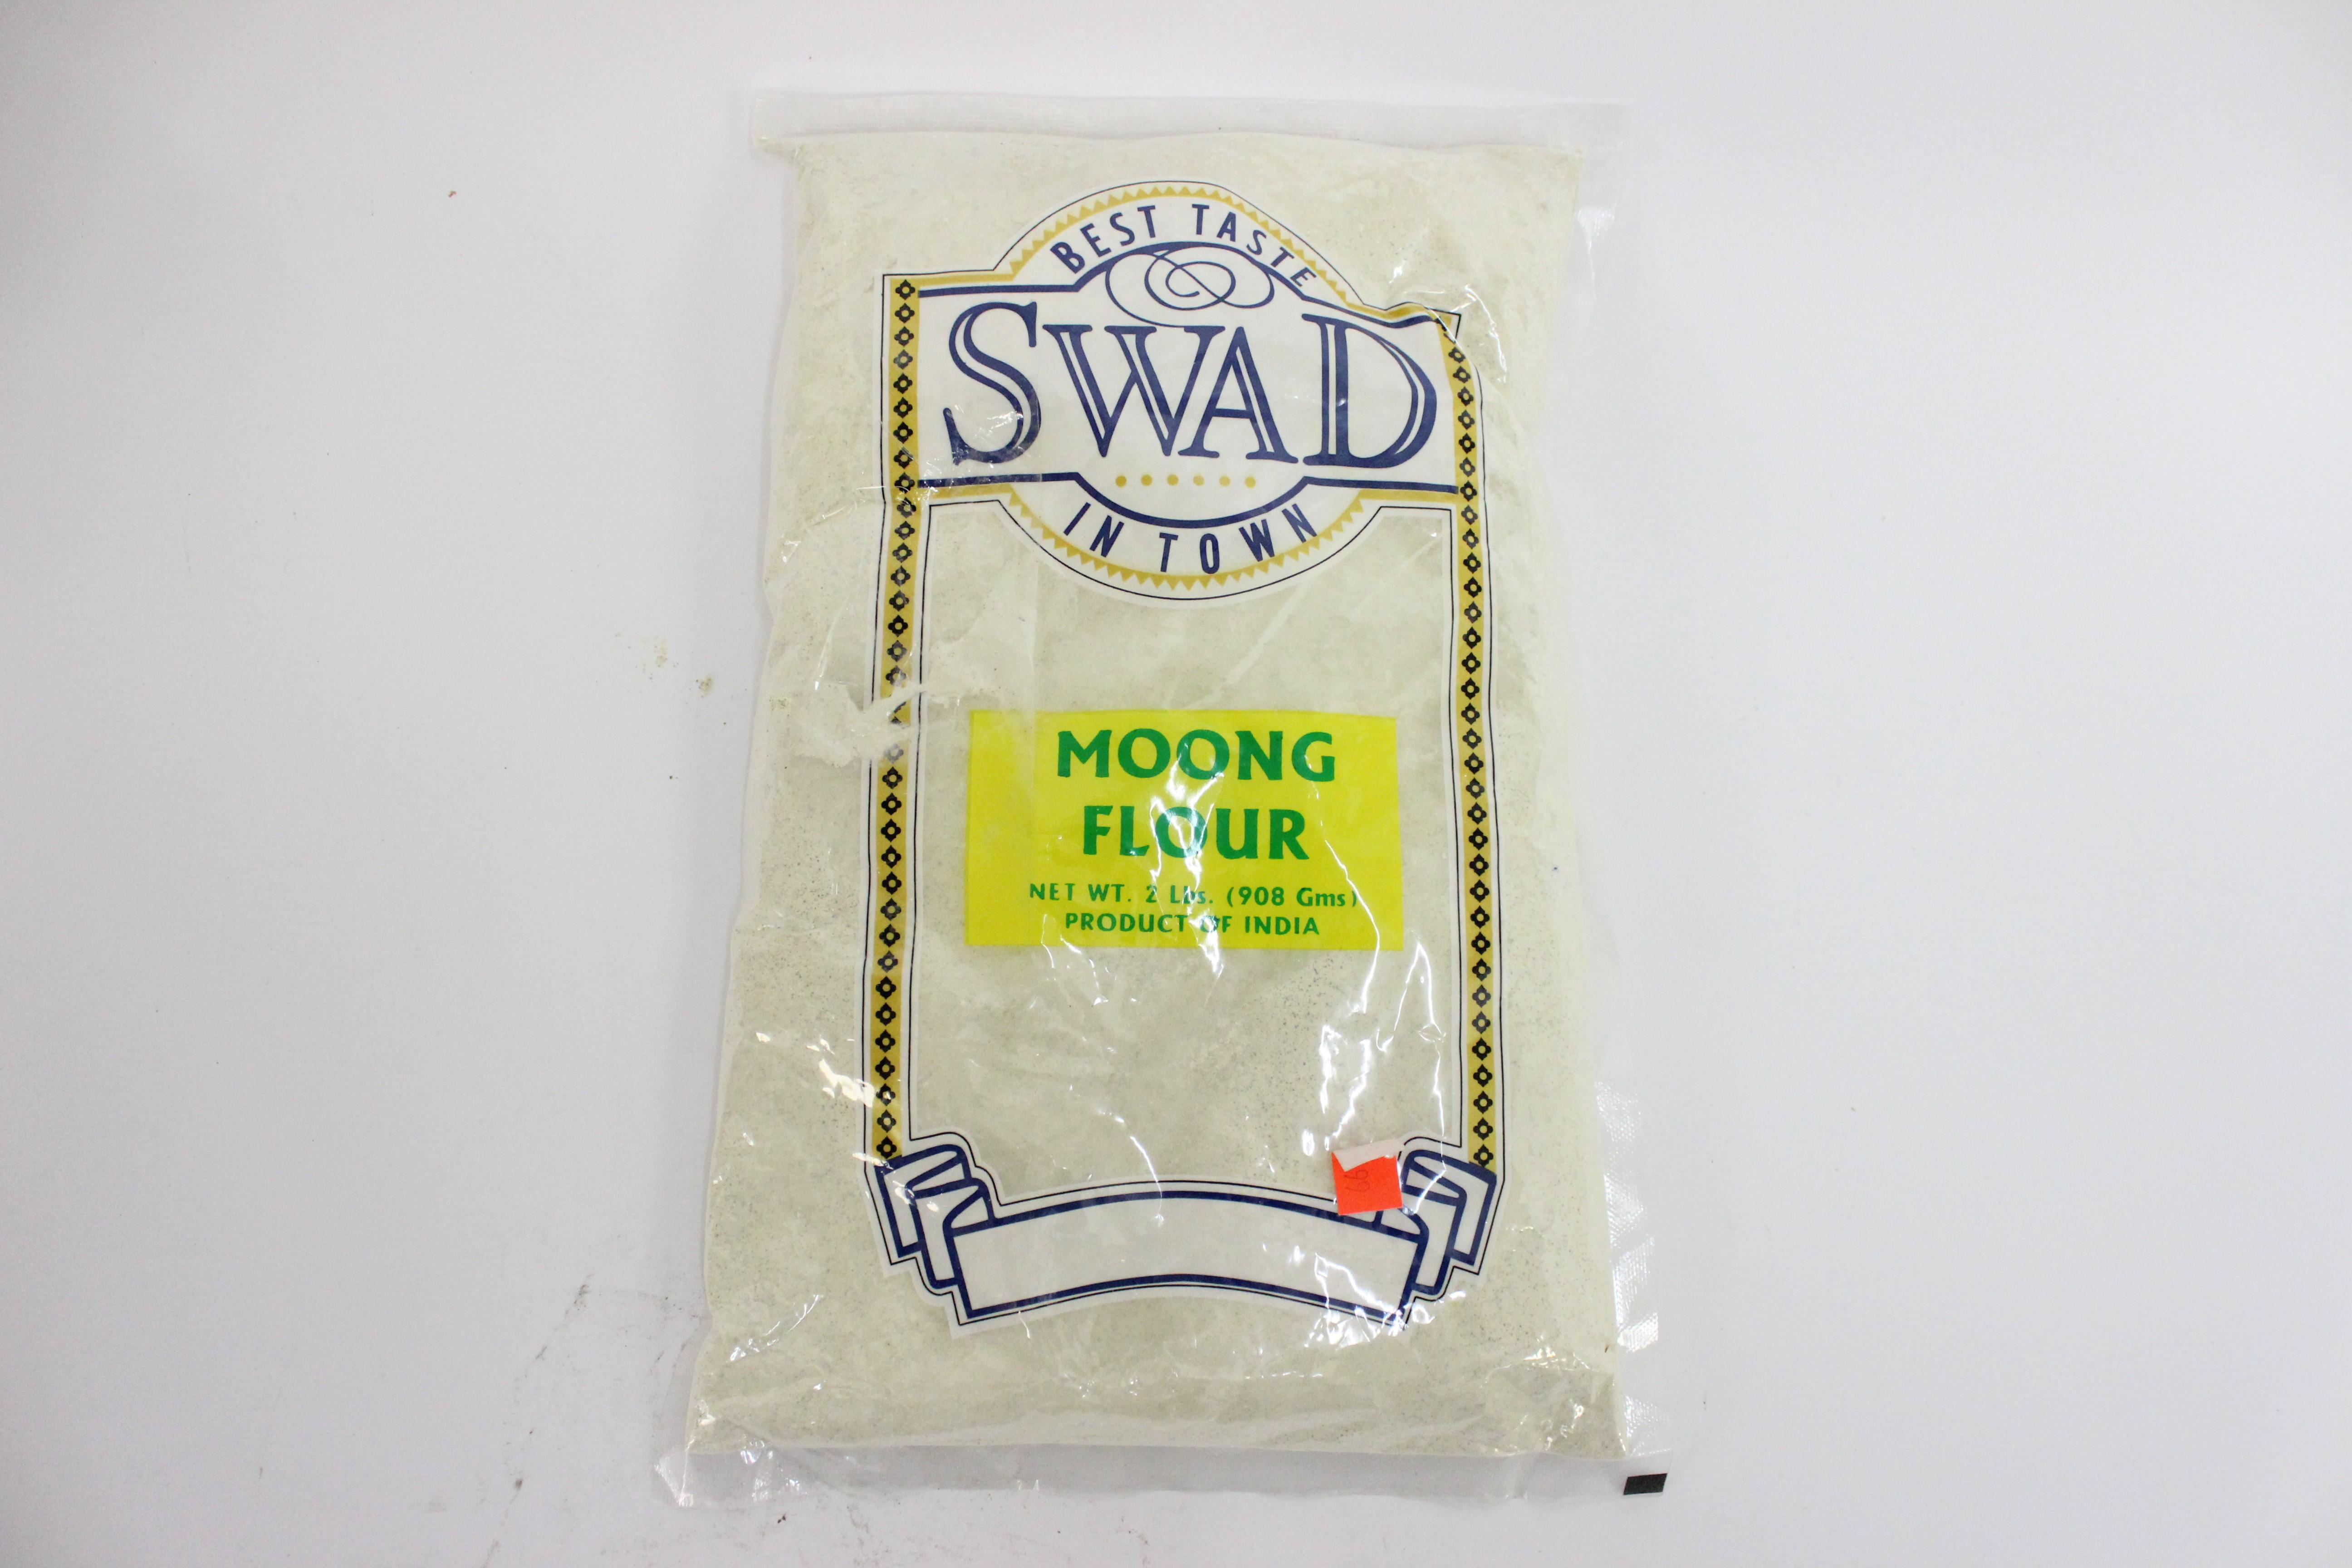 Moong Flour 2 lbs